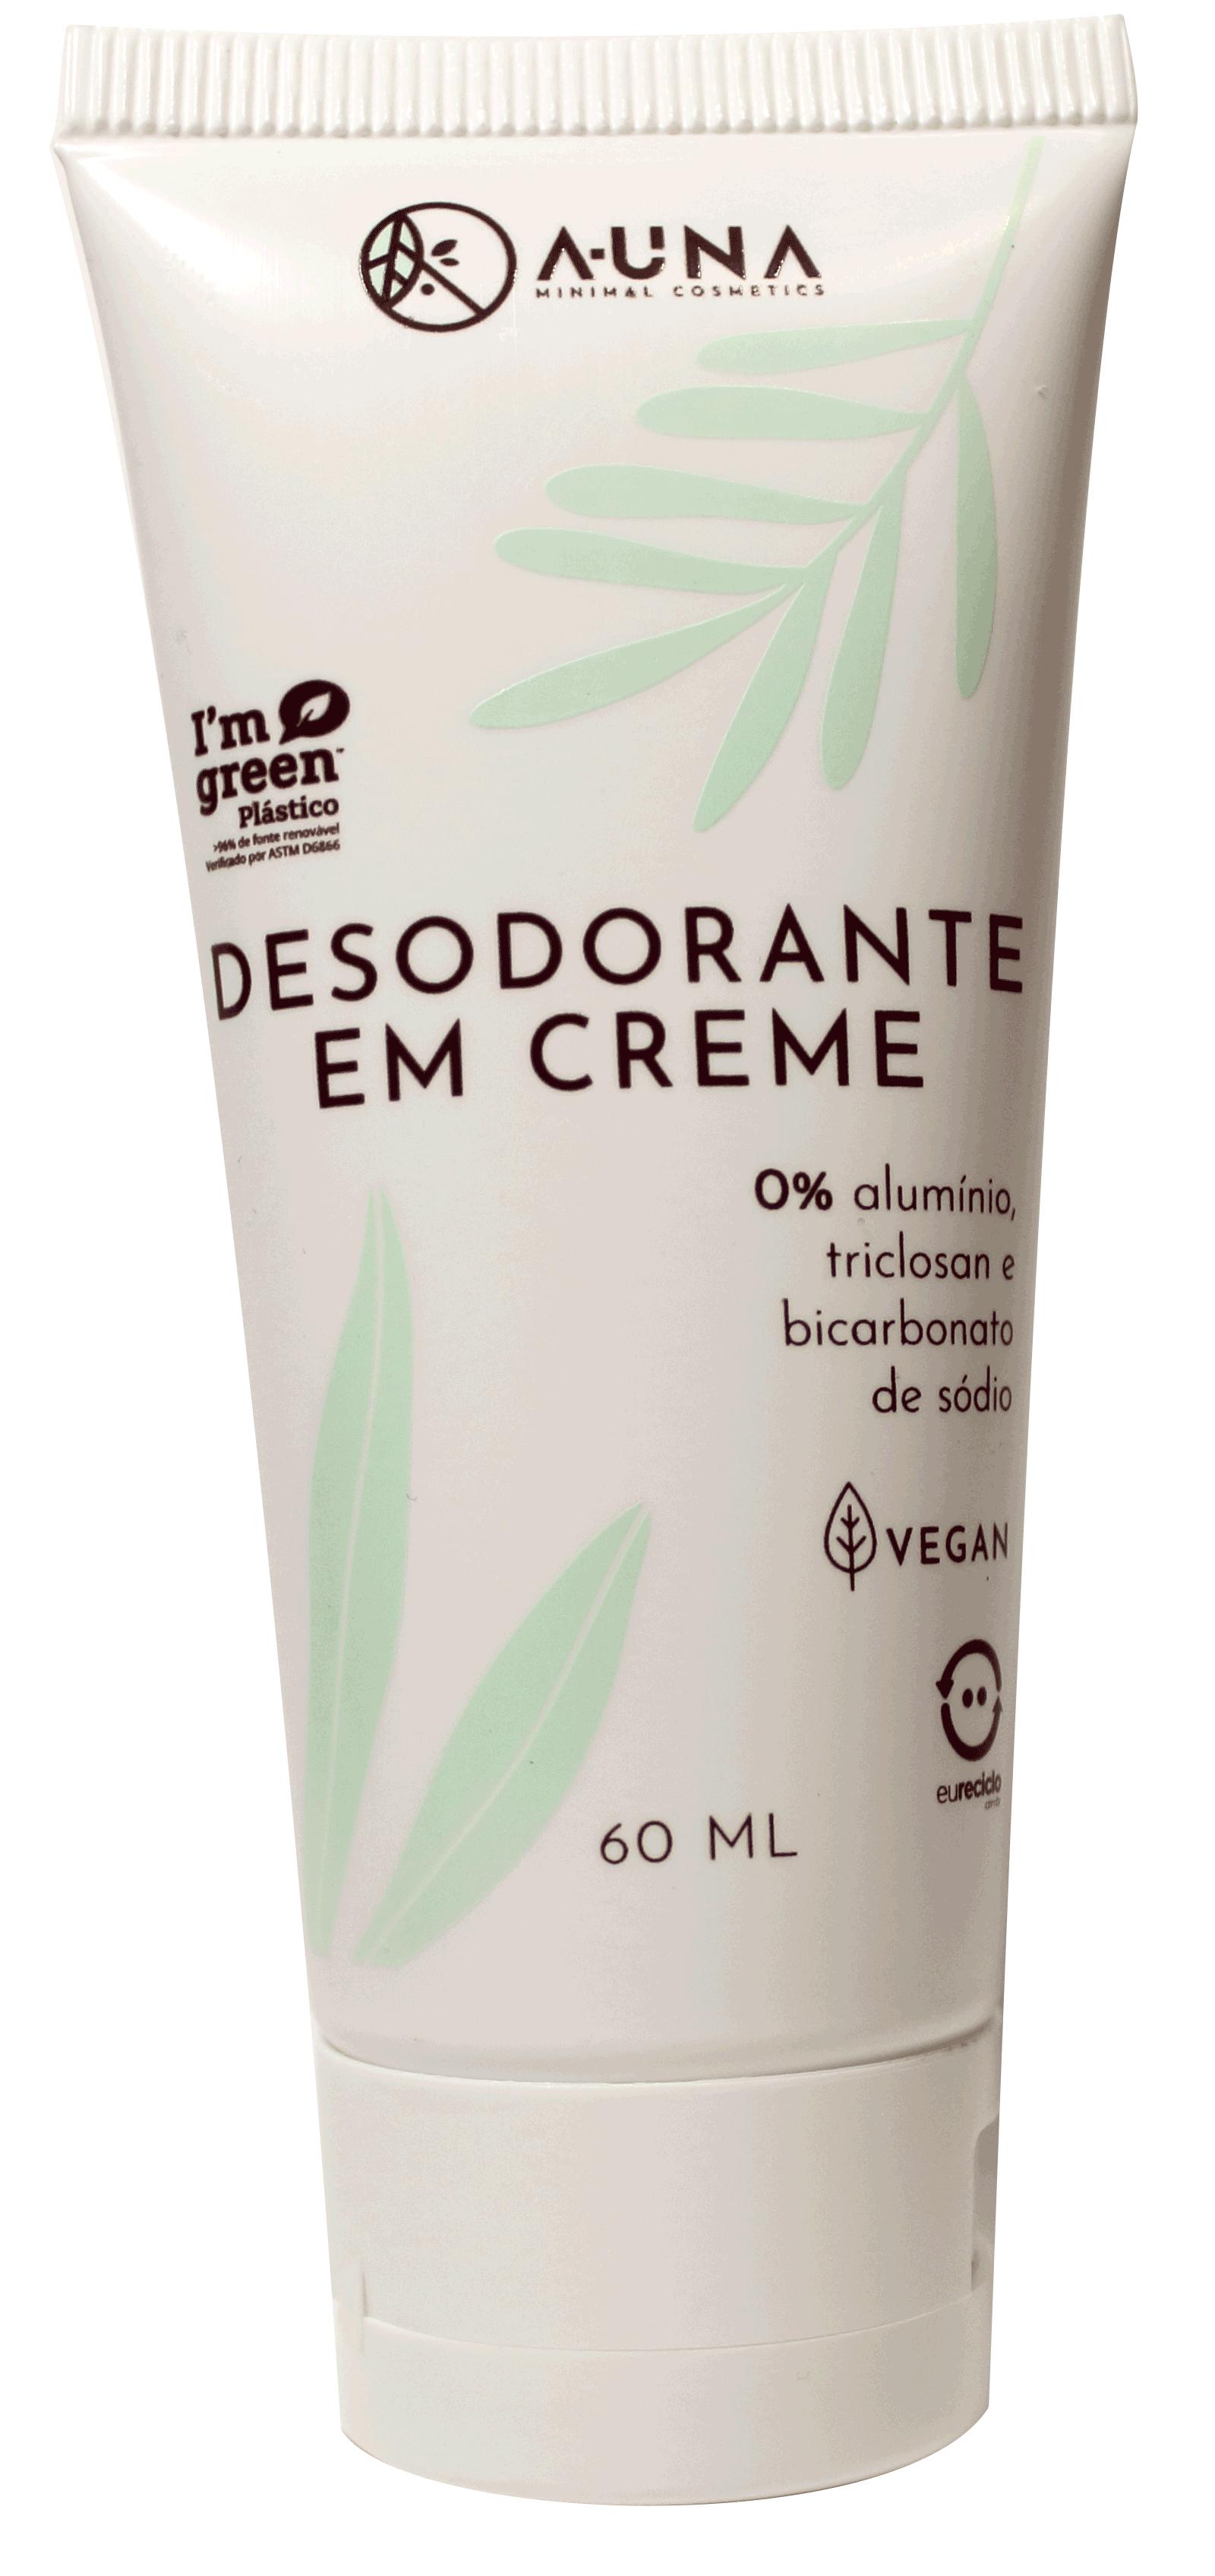 Desodorante em creme A-UNA - 0% Alumínio, Triclosan e Bicarbonato de Sódio - 60ml